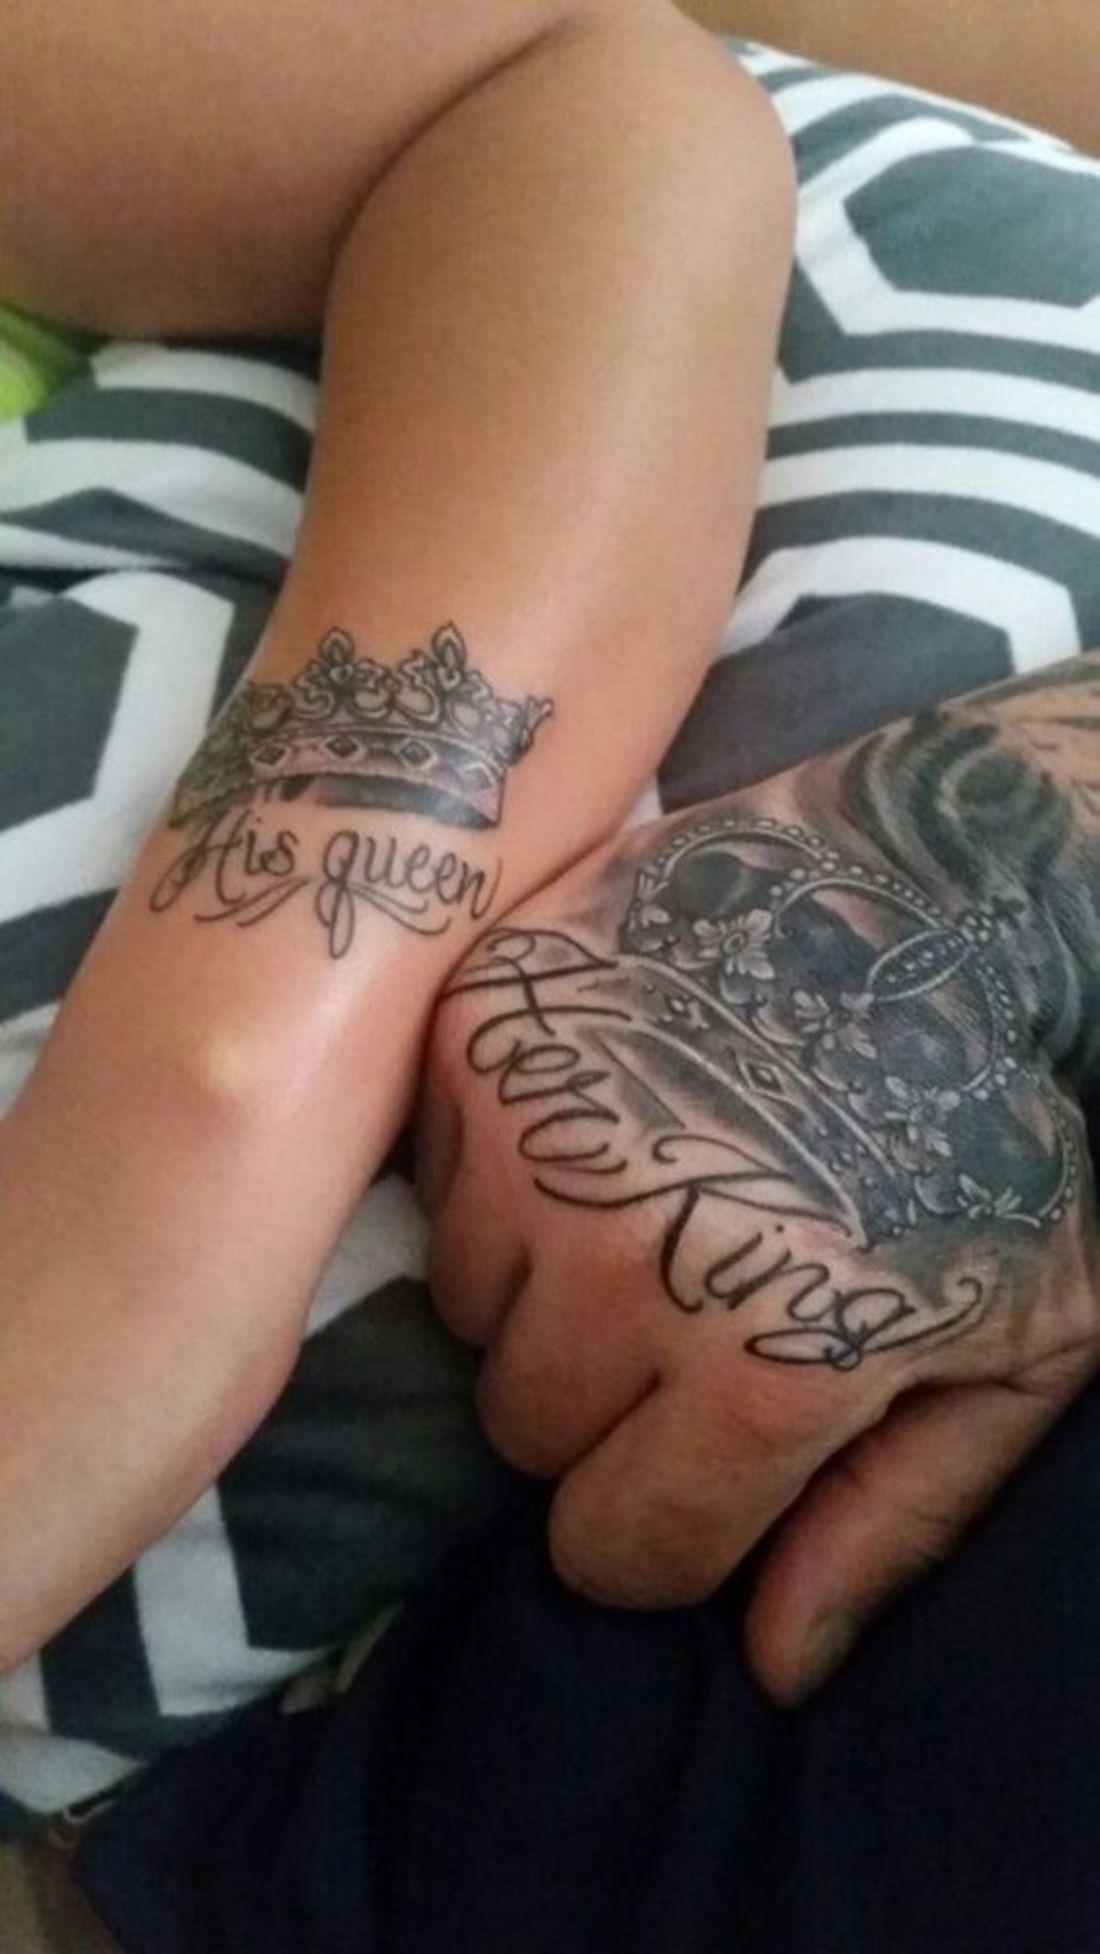 1001 Ideas Y Consejos De Tatuajes Para Parejas Tatuajes Que